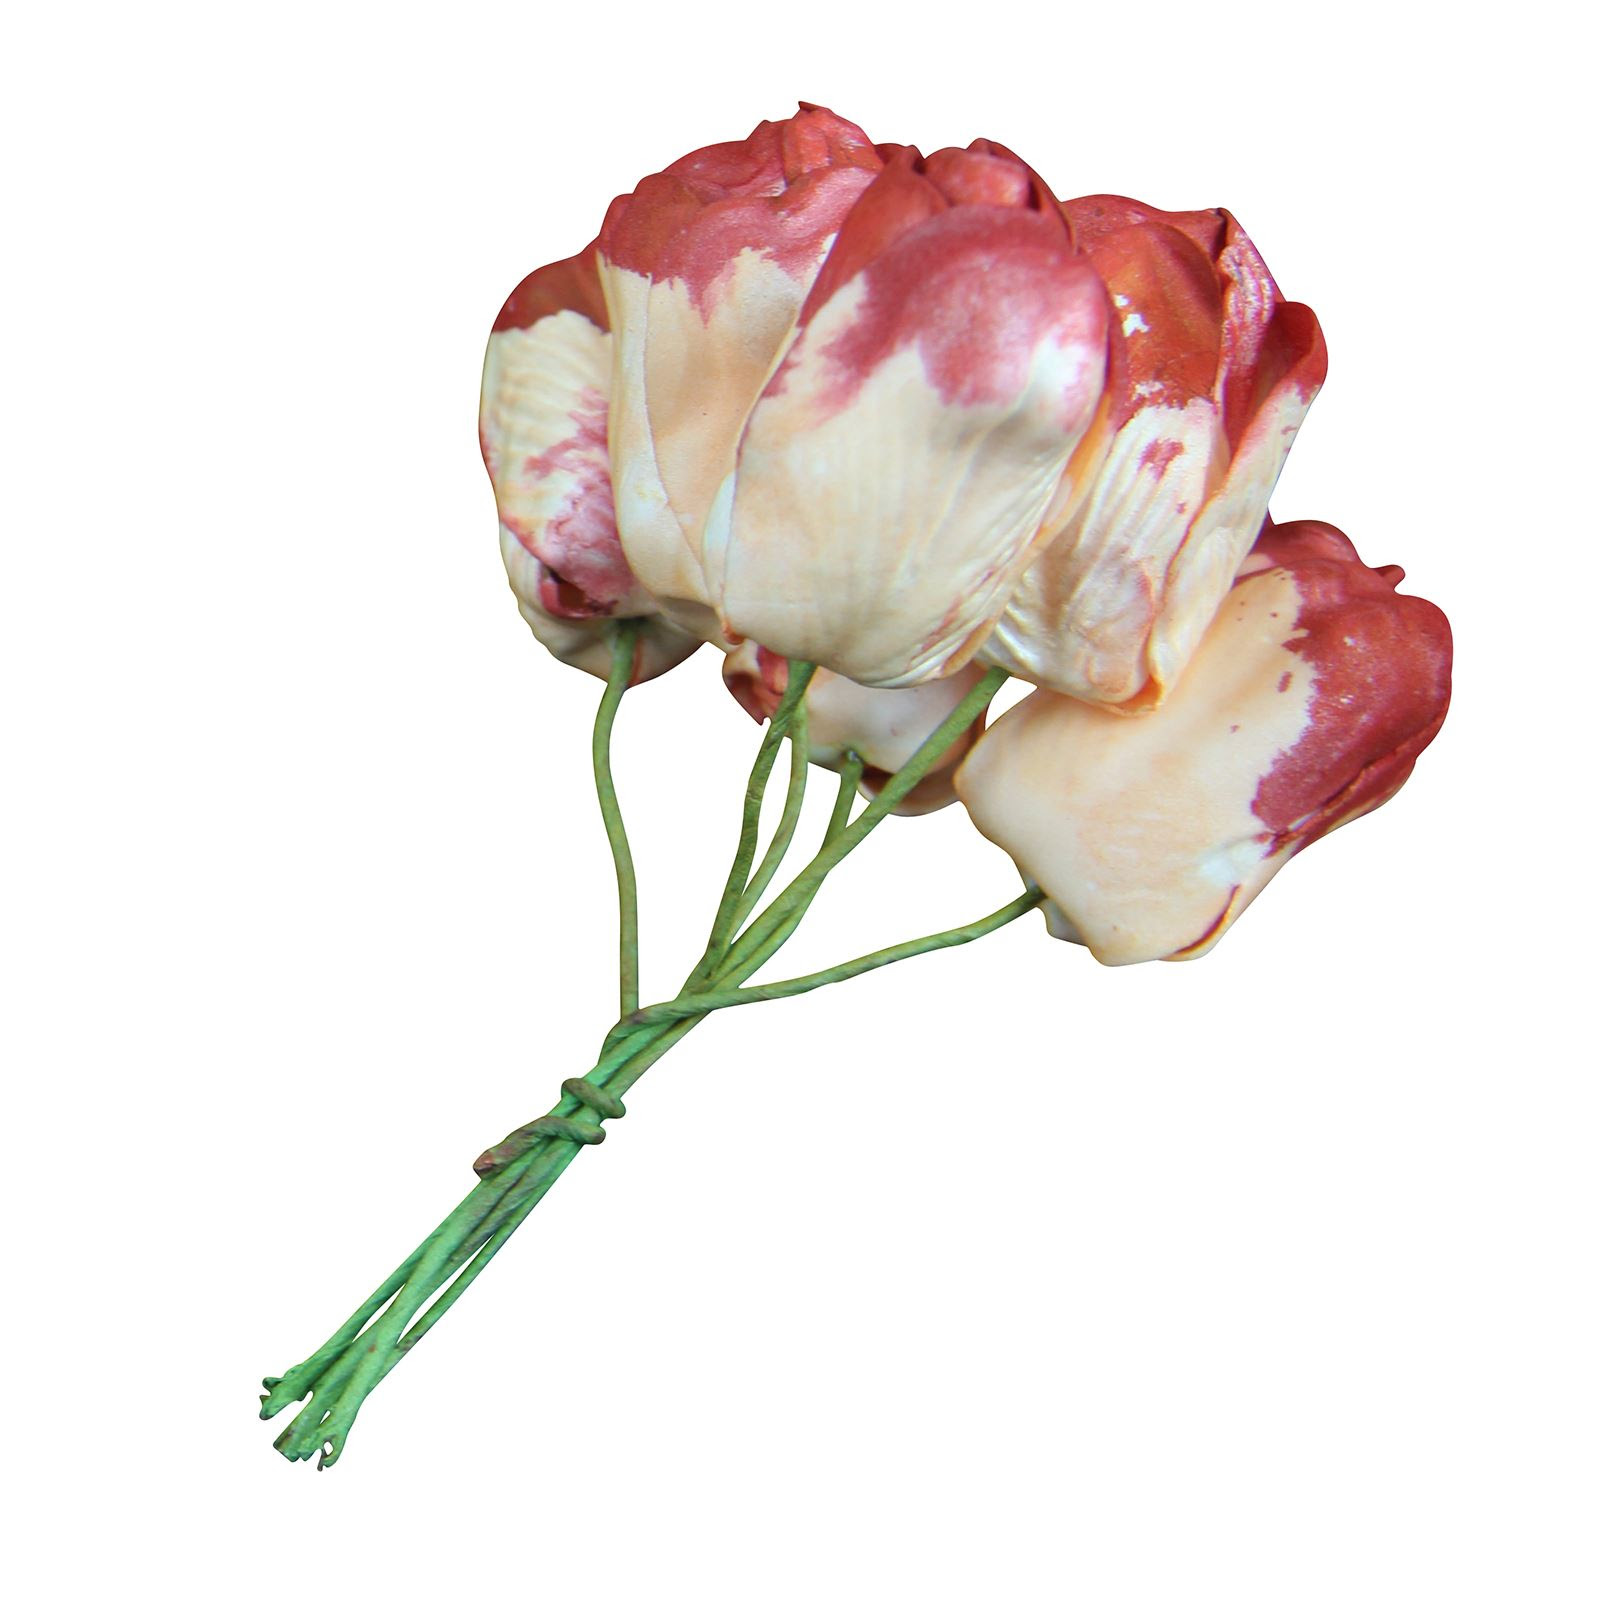 6x Bunches of 6 Foam Tulips! Wholesale Artificial Flowers Fake Bridal Bulk  eBay